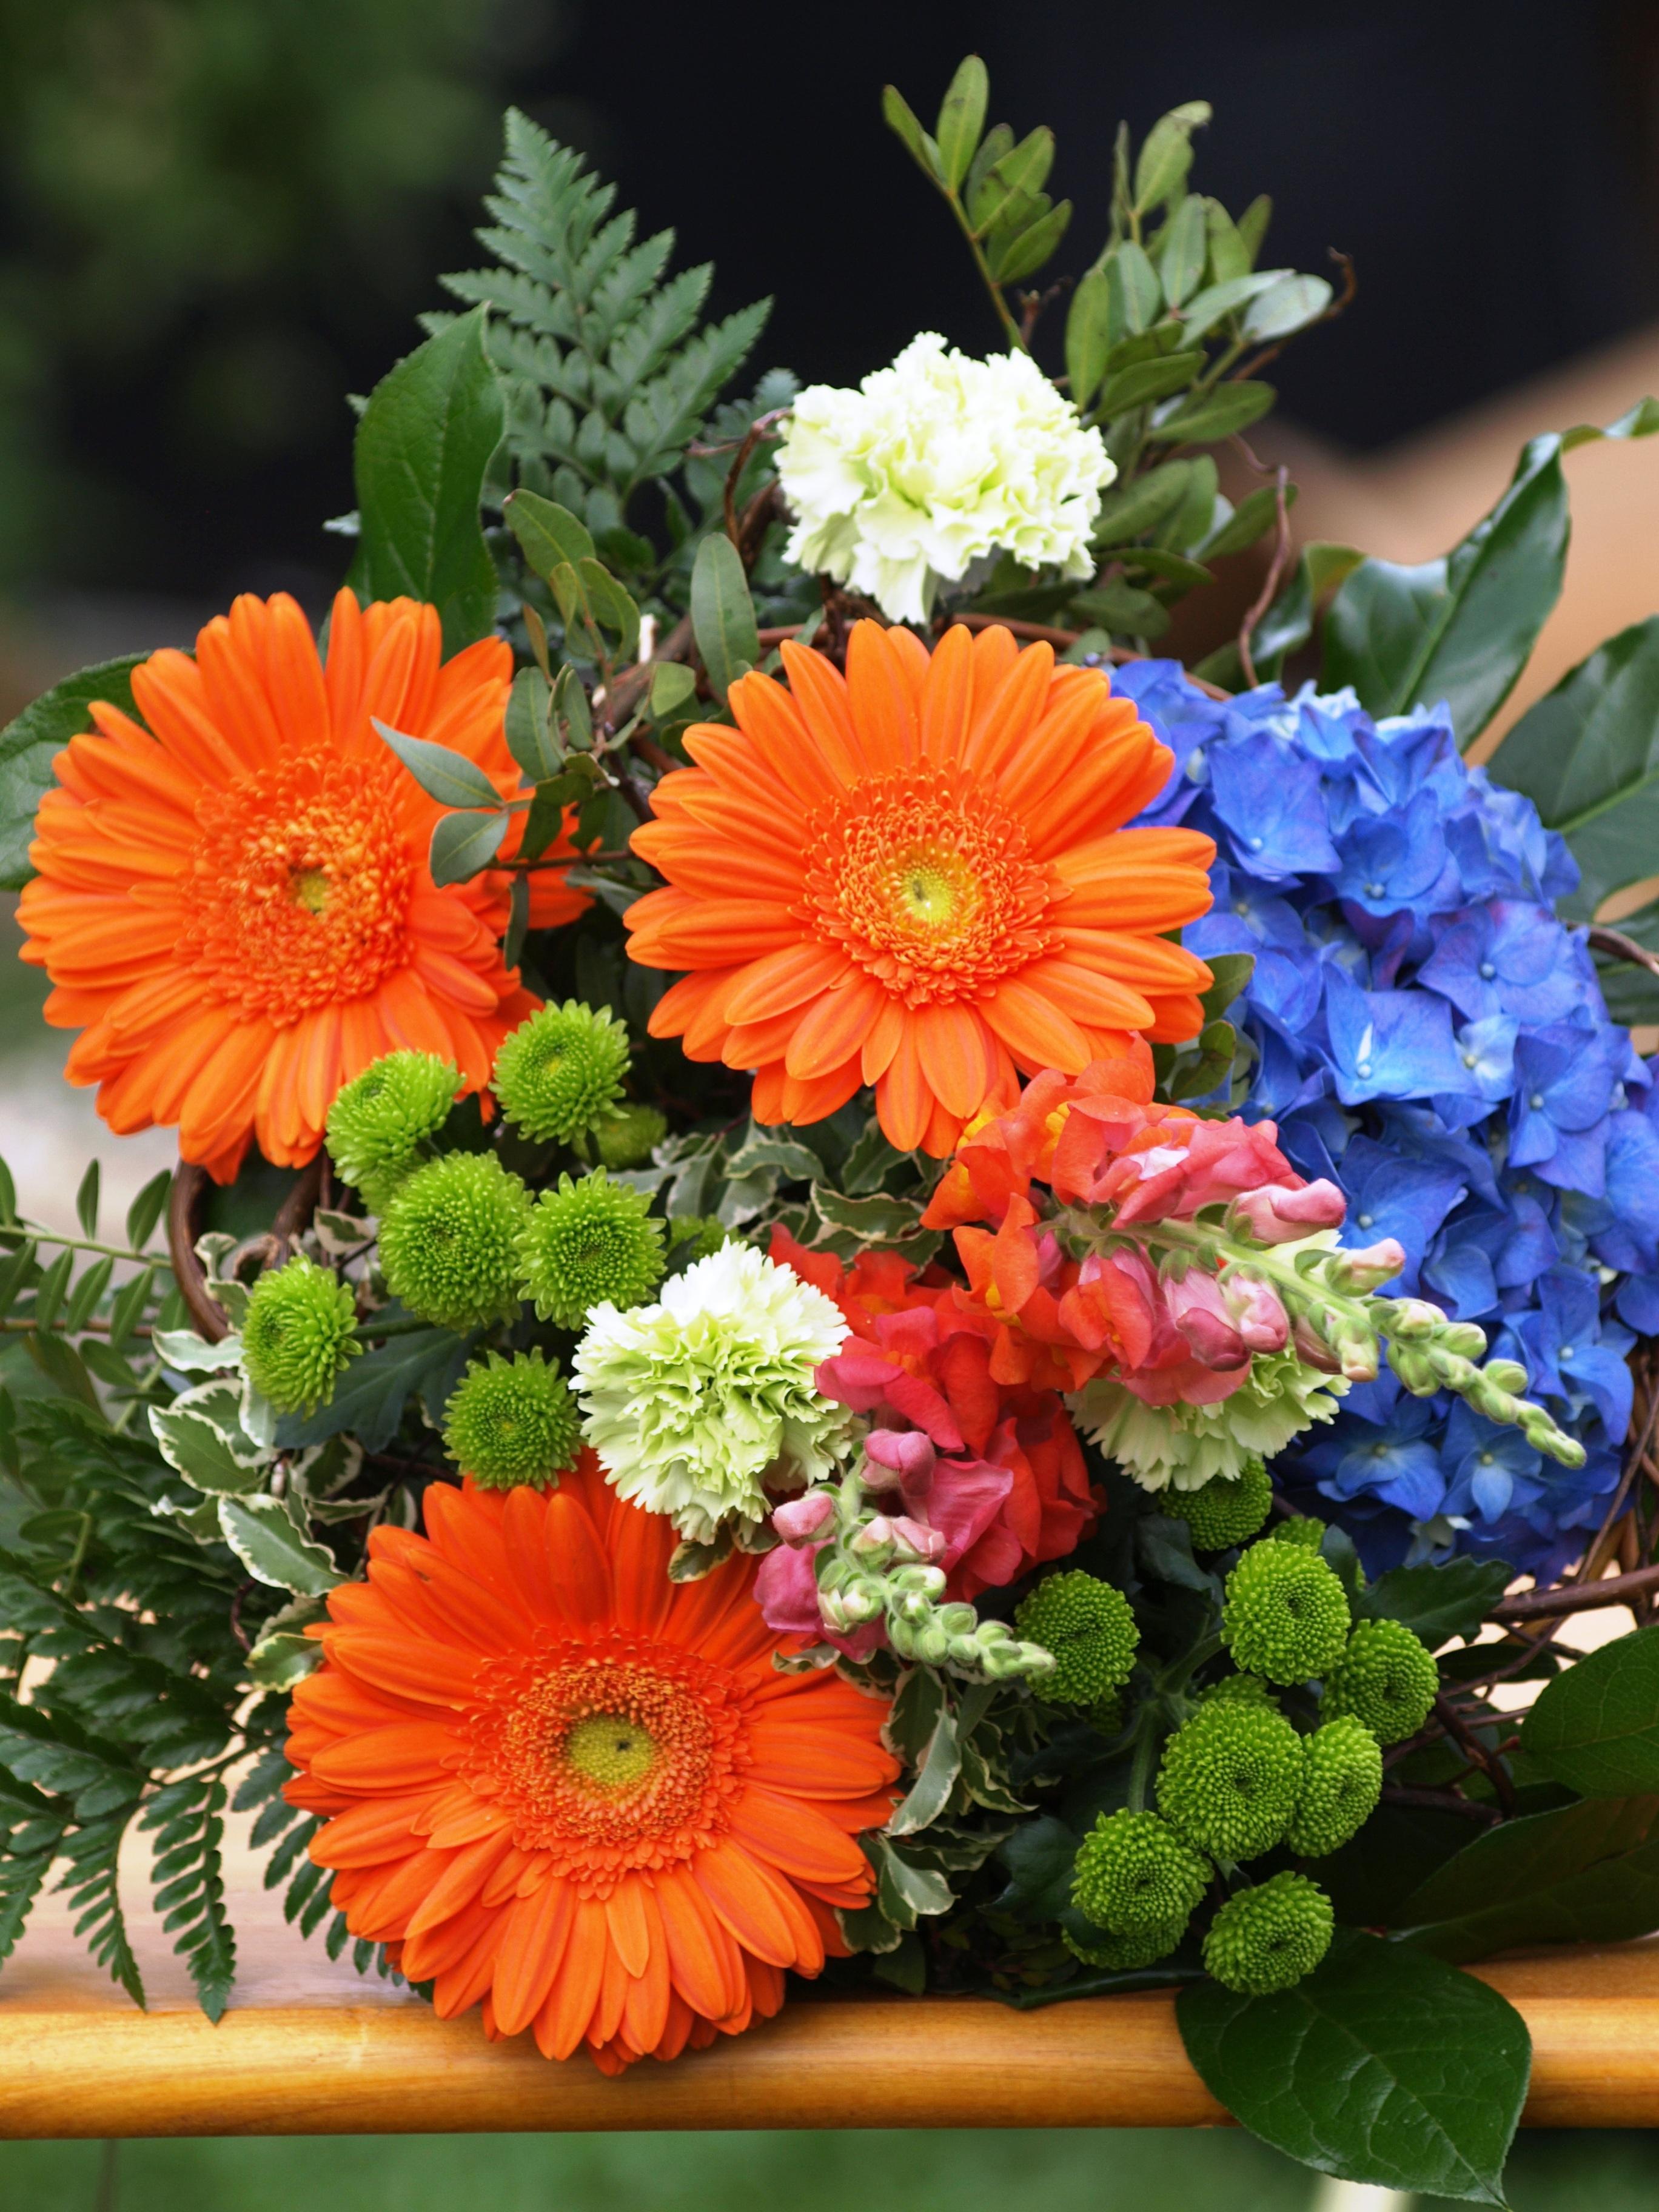 Fotos Gratis Flor Naranja Verde Color Azul Vistoso